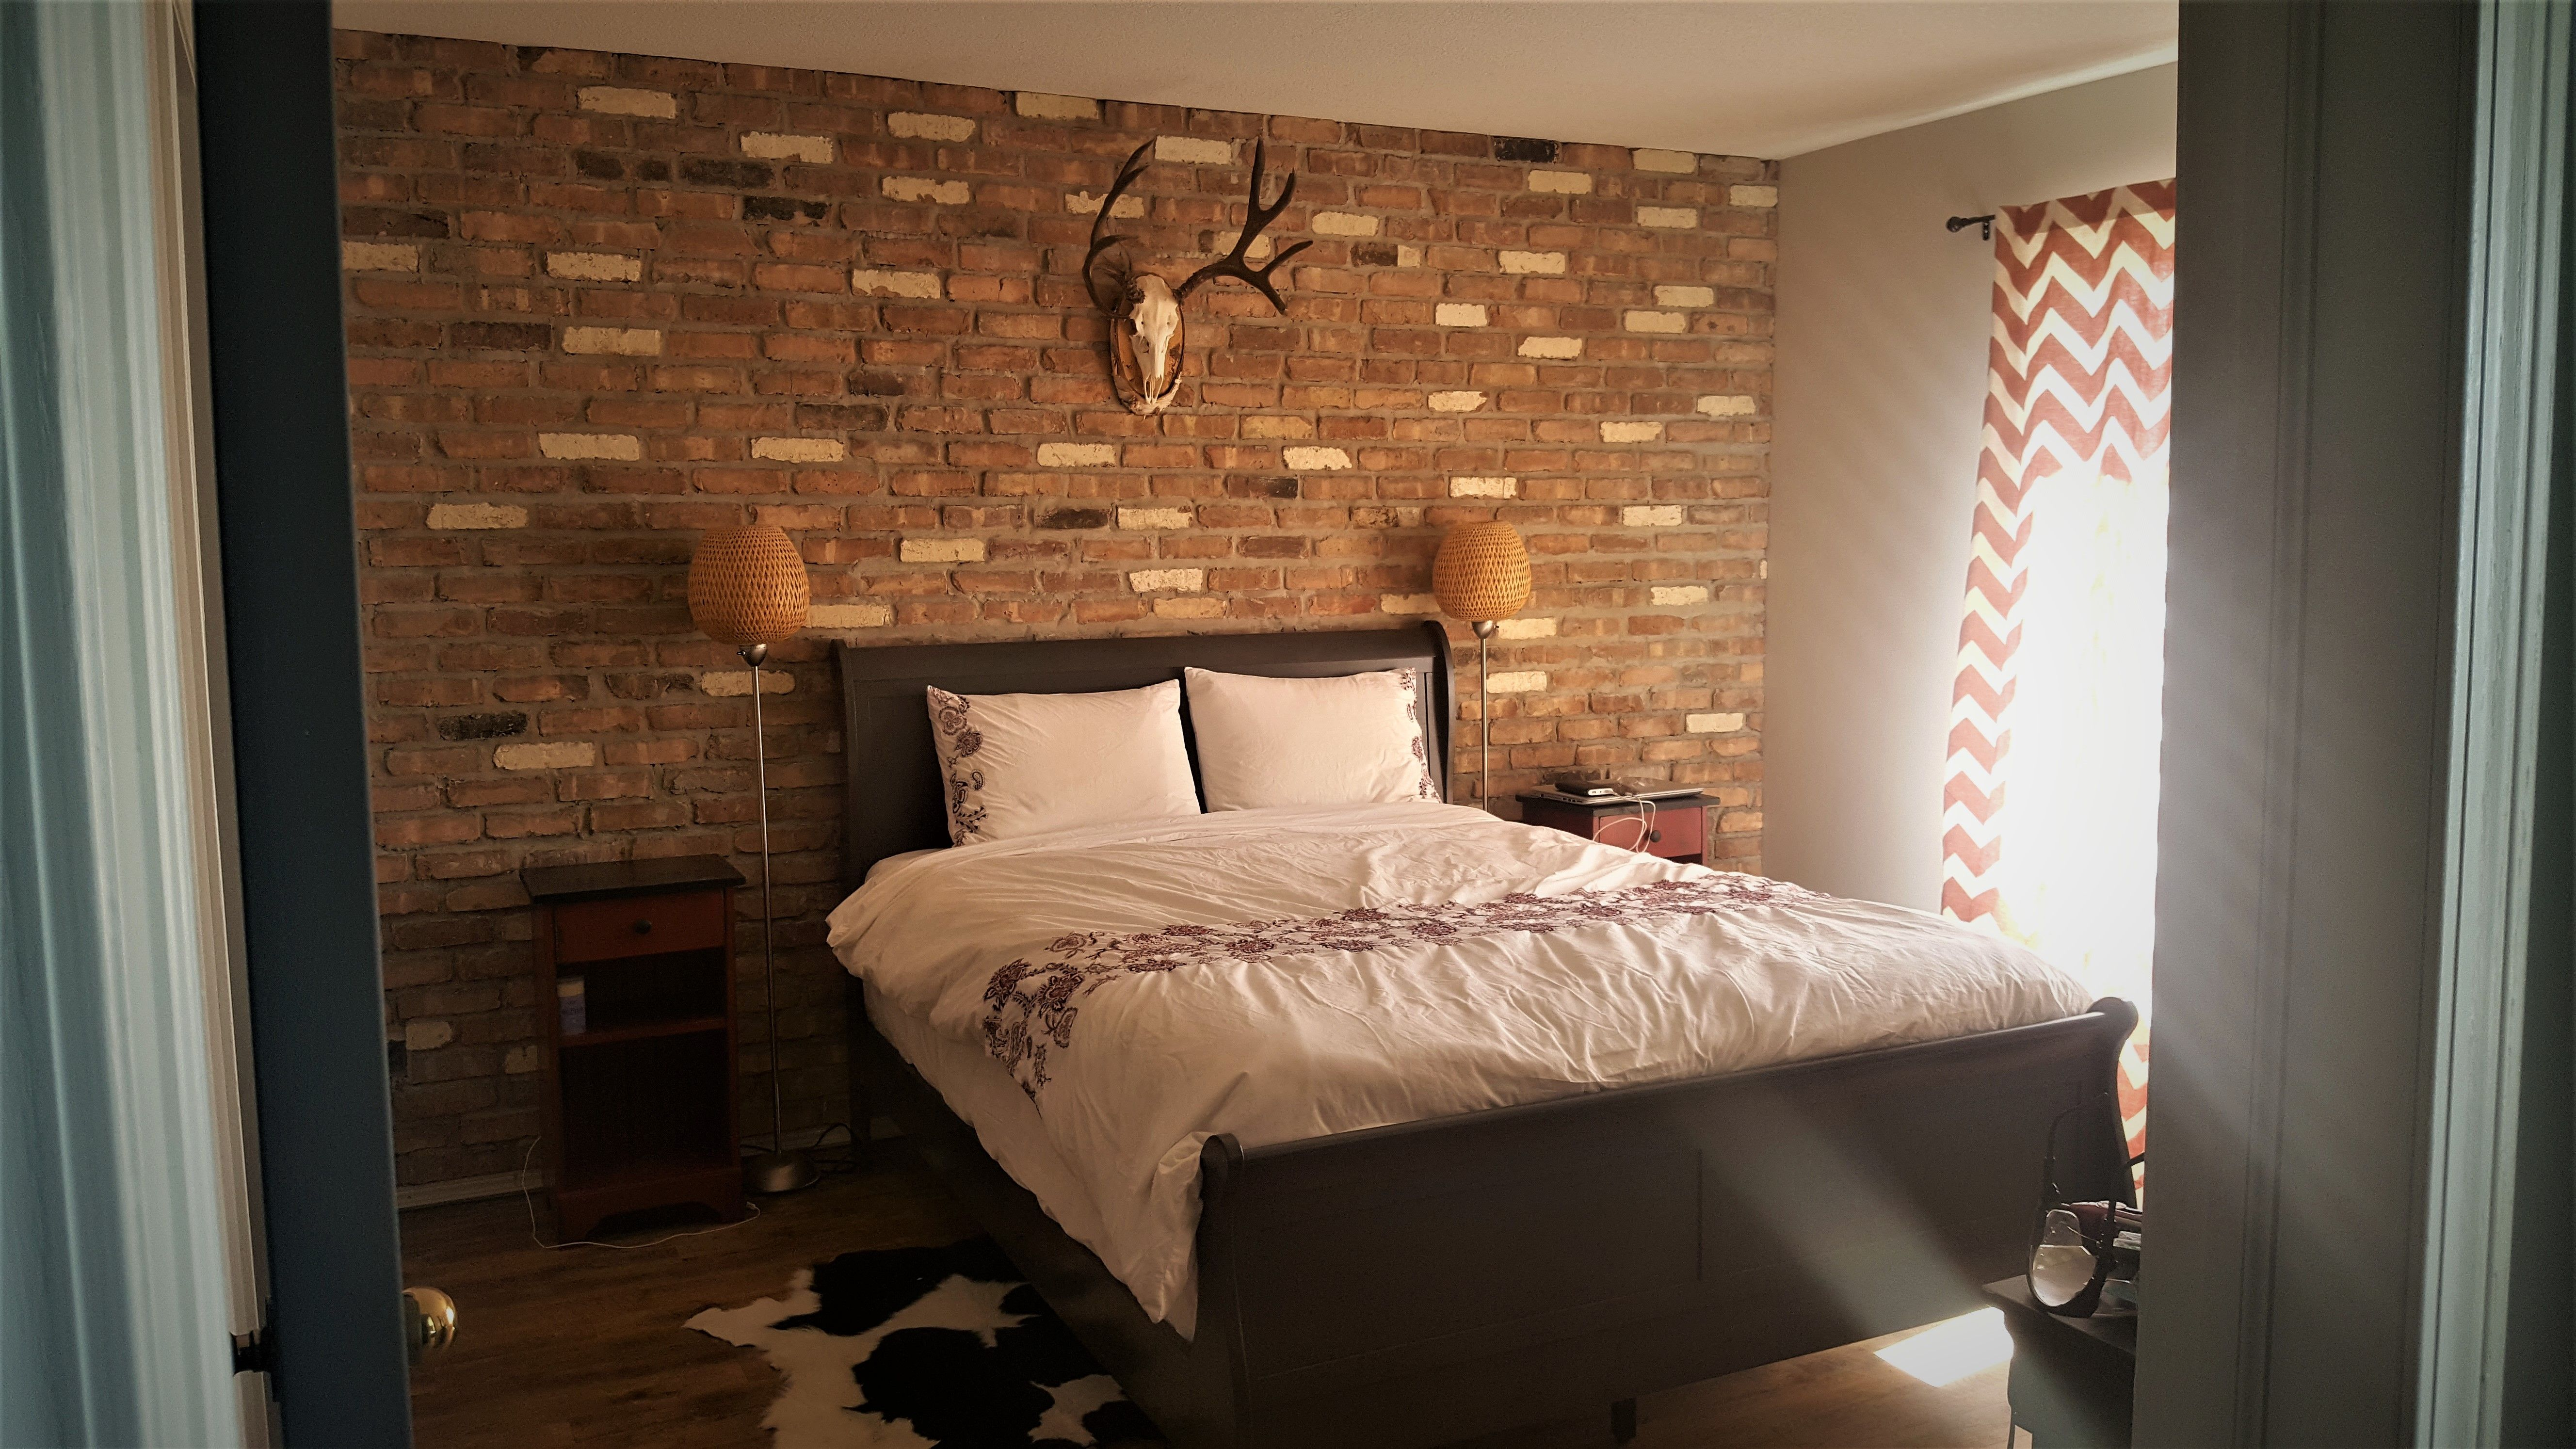 Brick Accent wall. Chicago Red Brick Brick accent walls